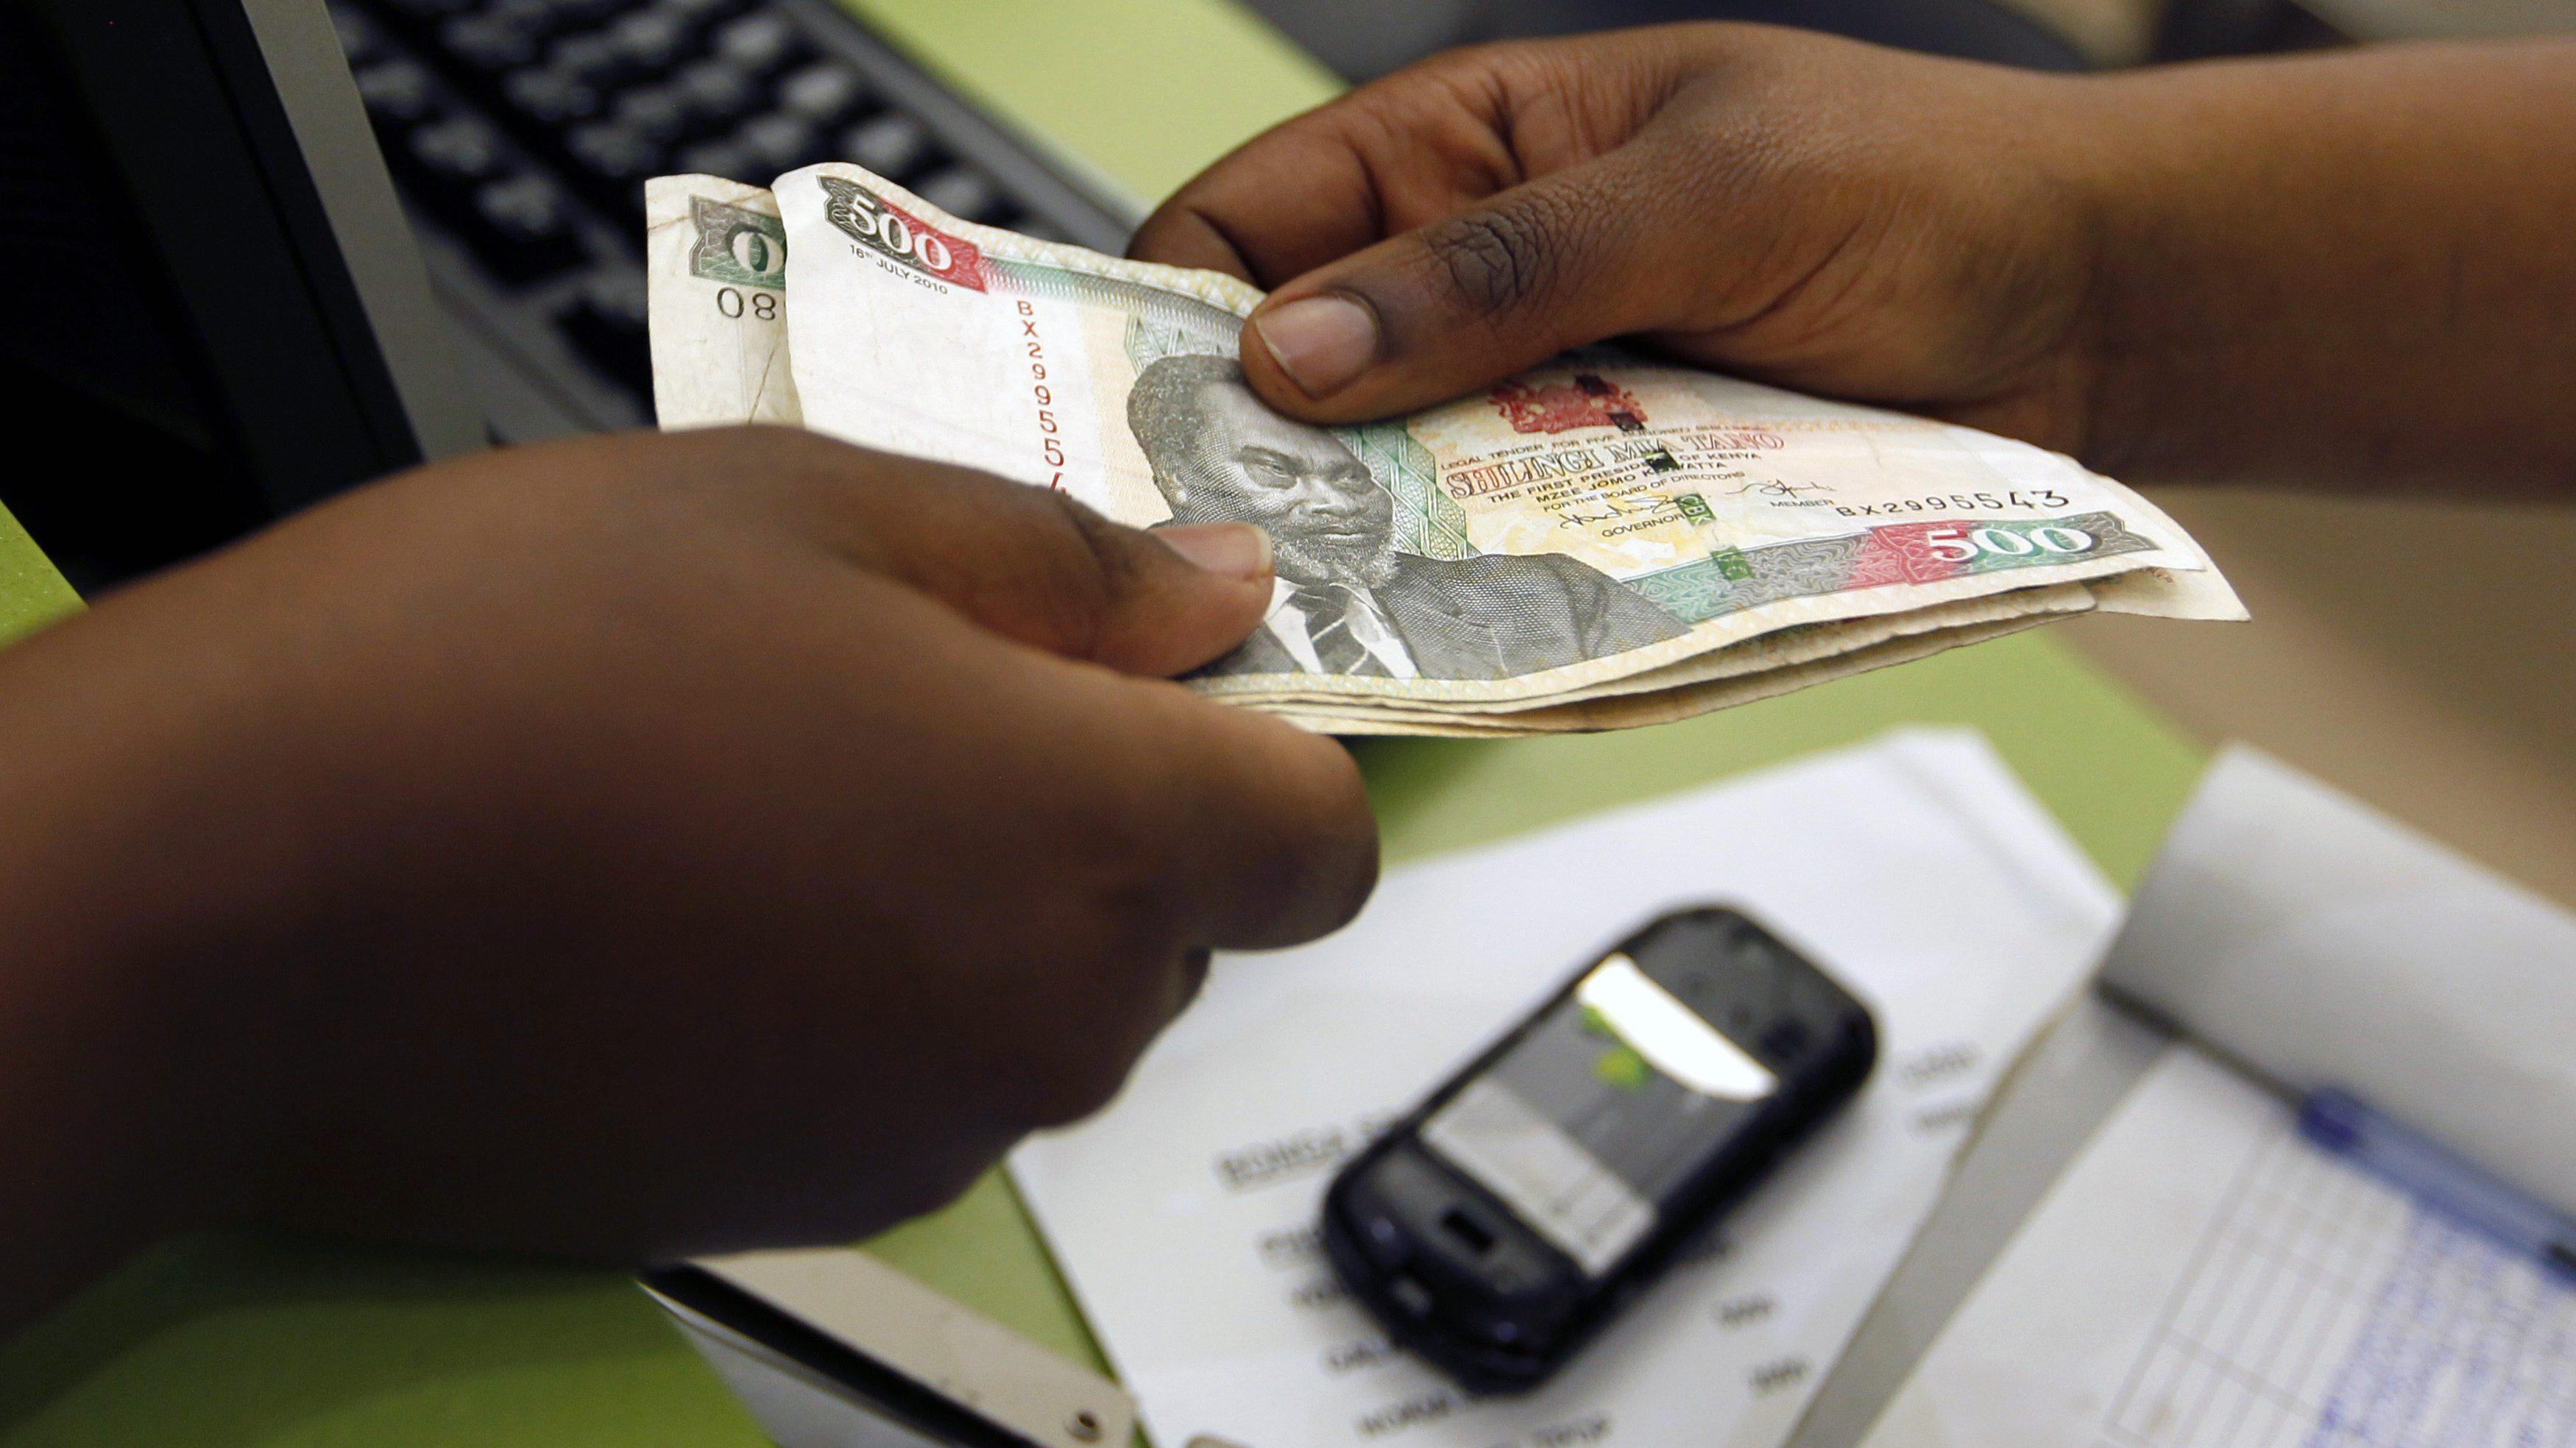 Mobile money lending in Kenya helps but also spikes debt